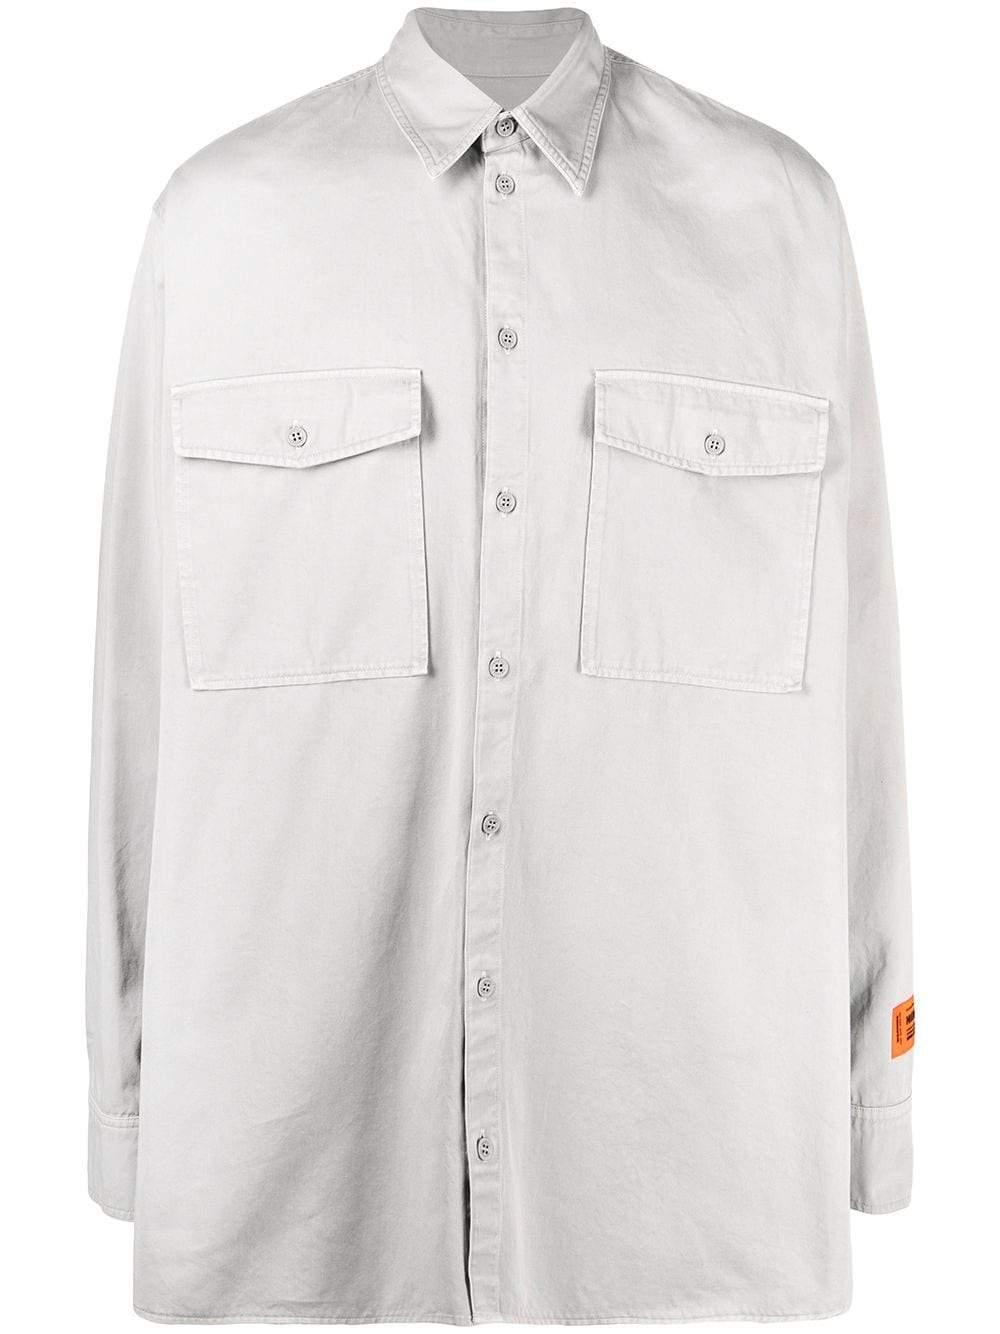 Heron Preston Shirts Grey